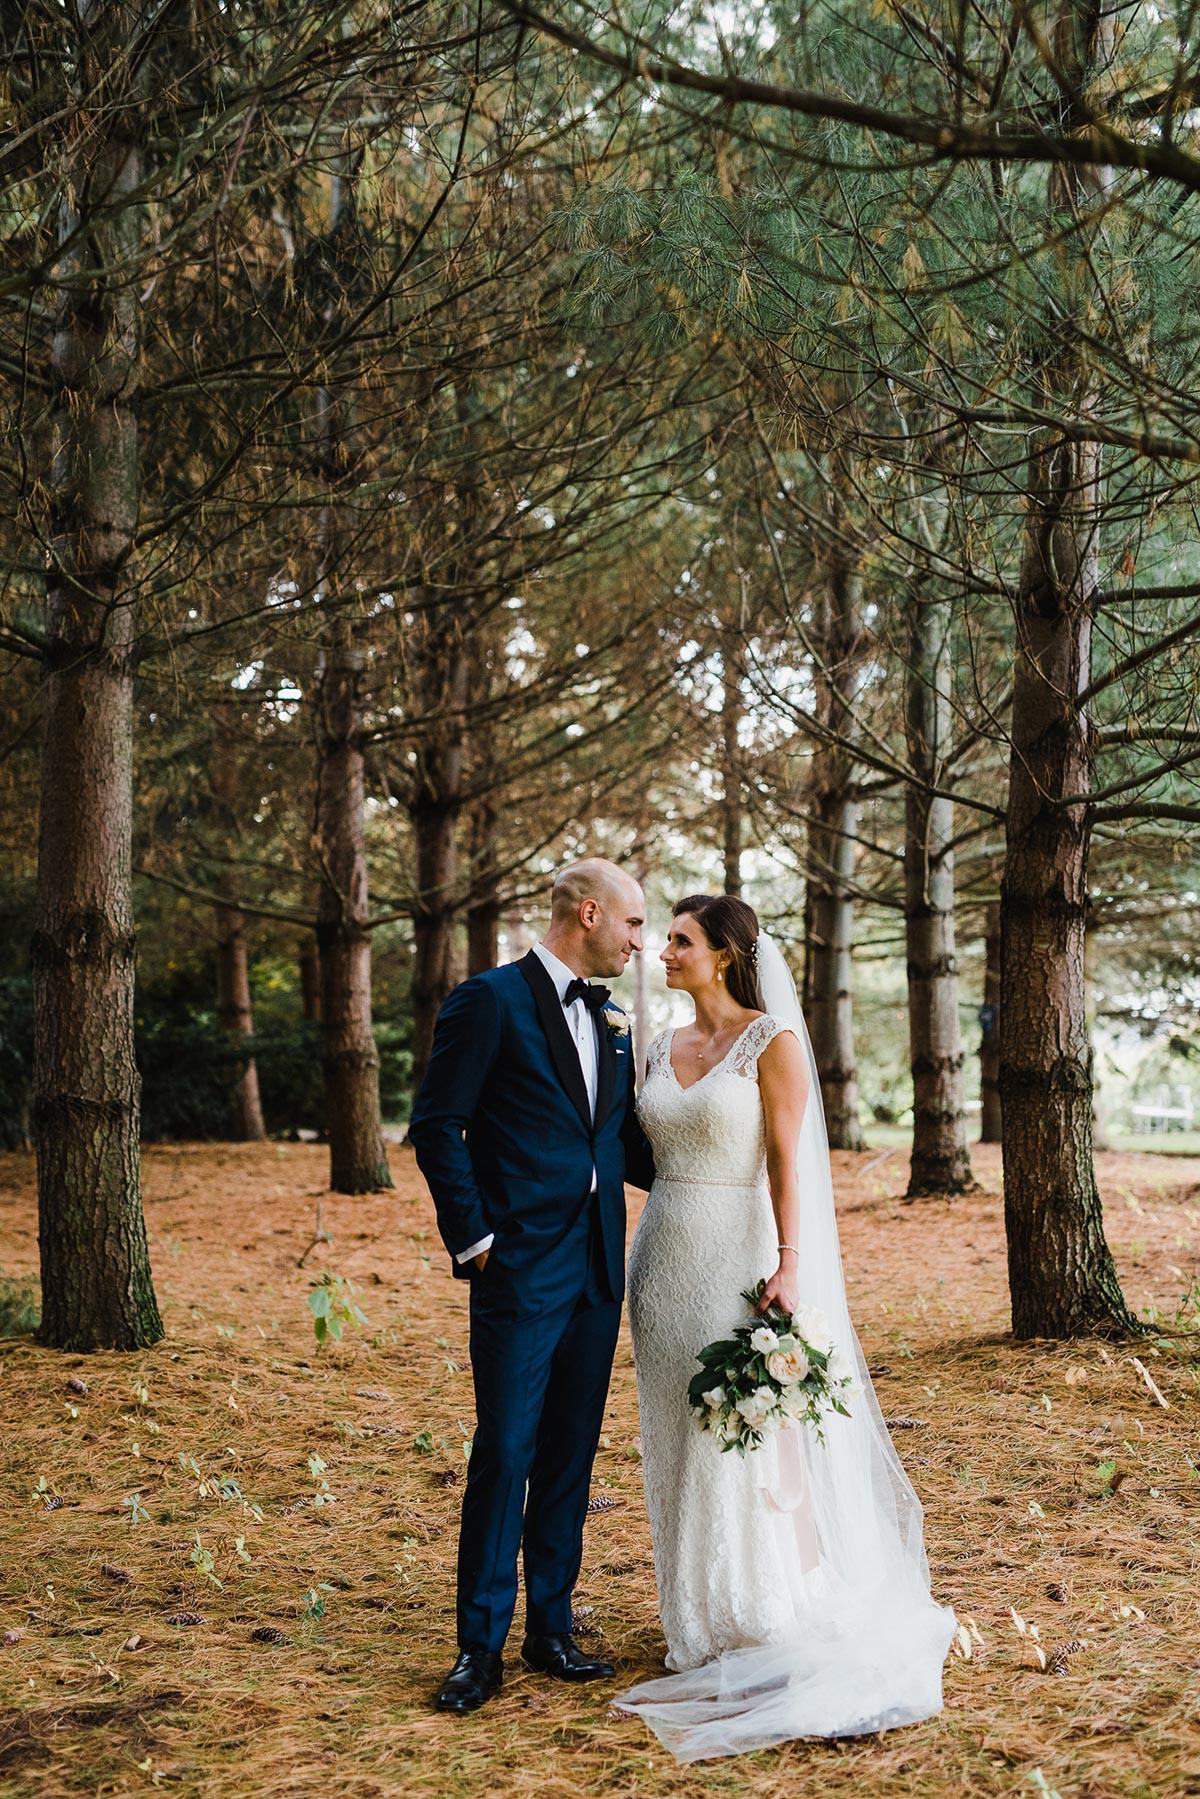 shaw-events-vineyard-bride-swish-list-kurtz-orchards-niagara-on-the-lake-wedding-66.jpg